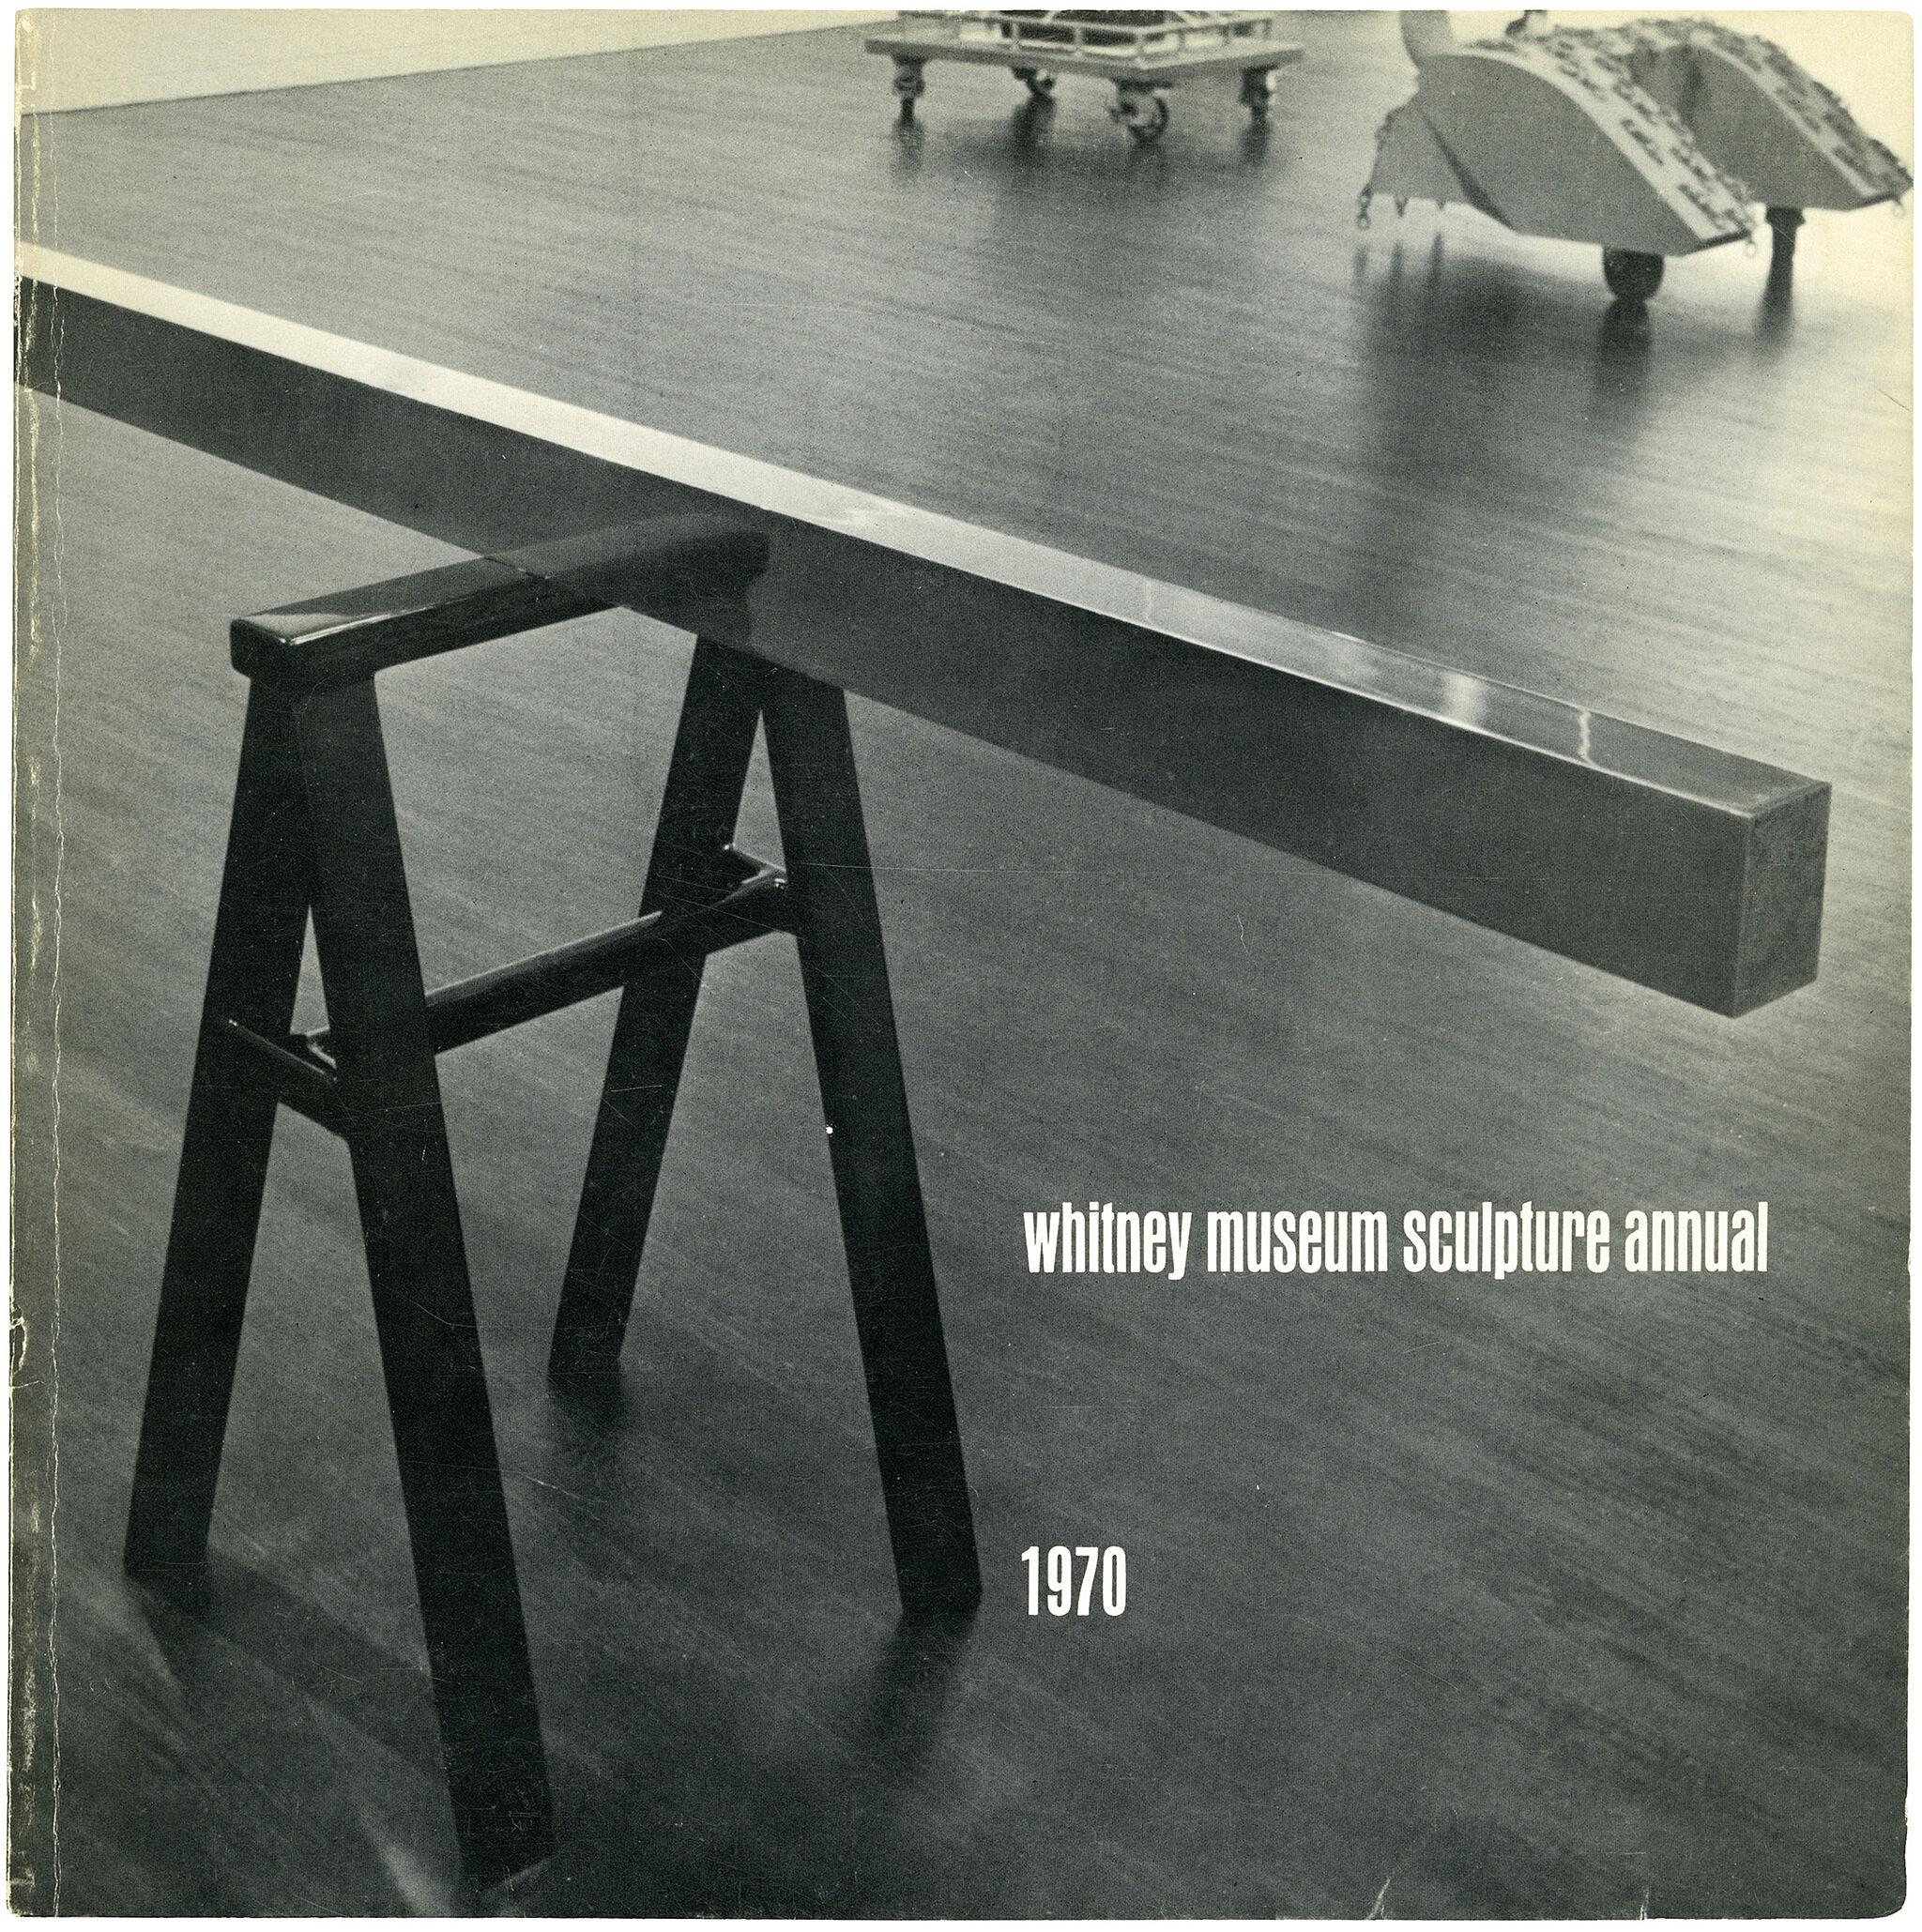 Catalogue cover for 1970 Annual exhibition: Contemporary American Sculpture